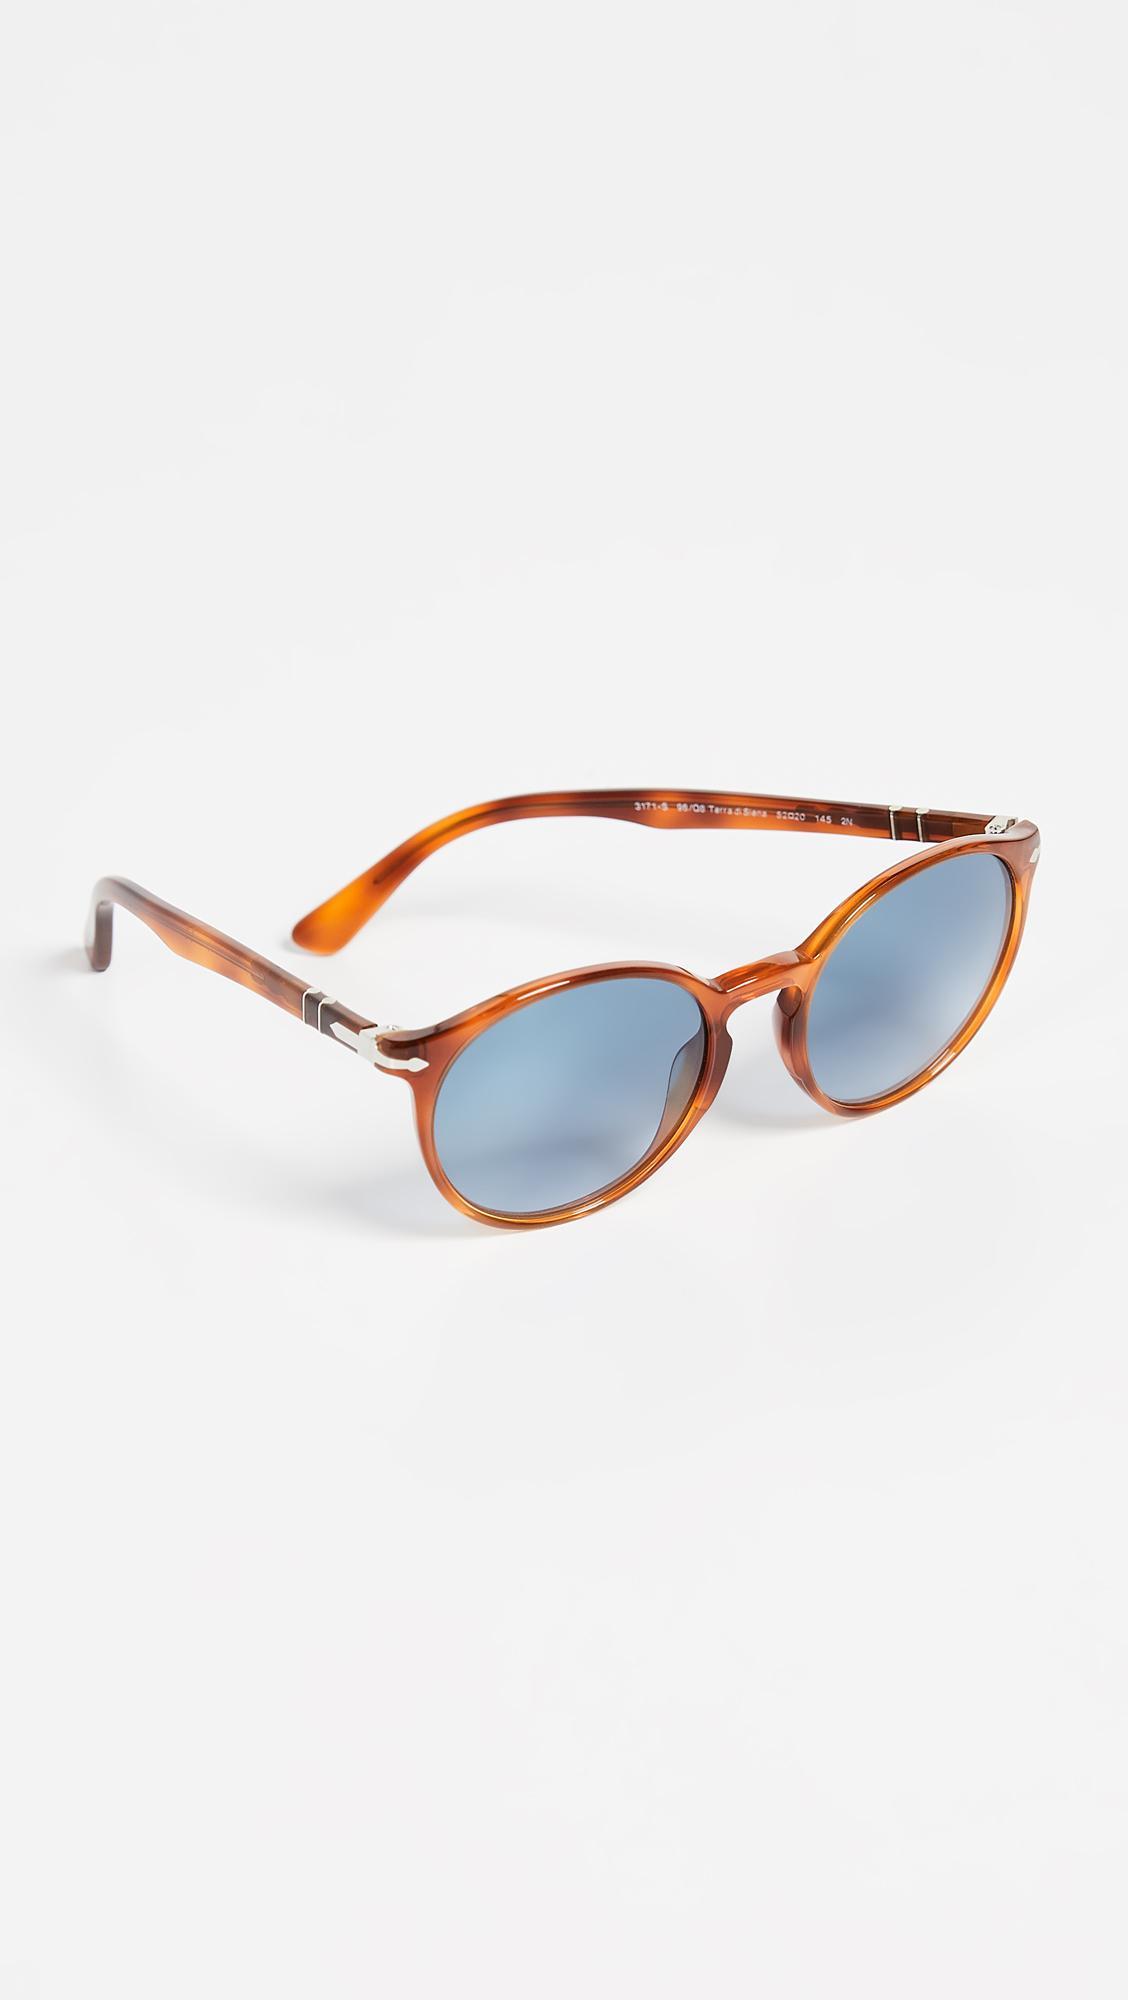 3cea9e1e6567a Persol - Blue Terra Di Siena Round Sunglasses for Men - Lyst. View  fullscreen